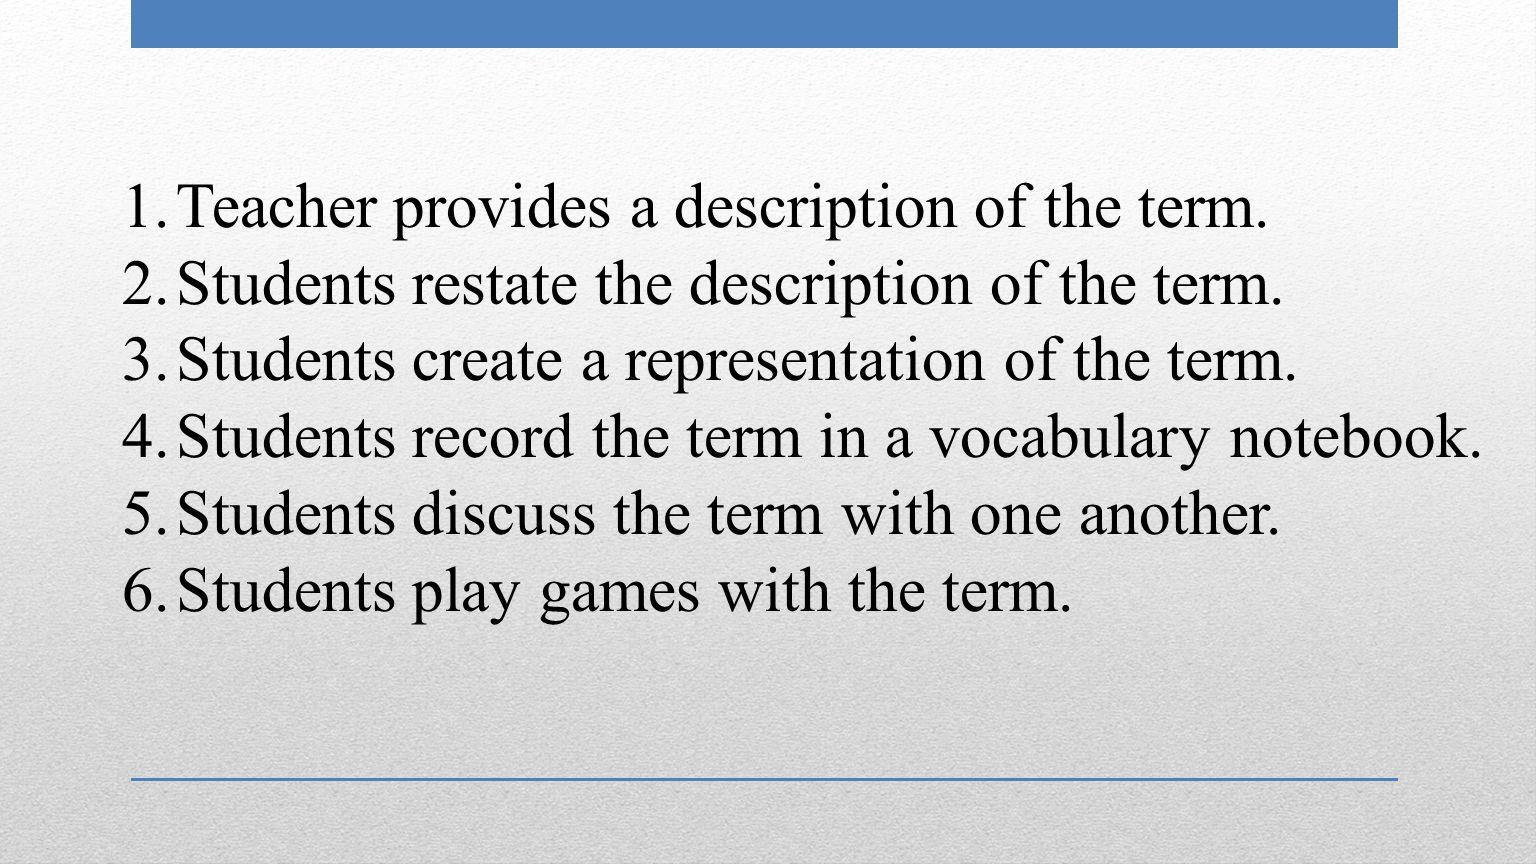 1.Teacher provides a description of the term. 2.Students restate the description of the term.